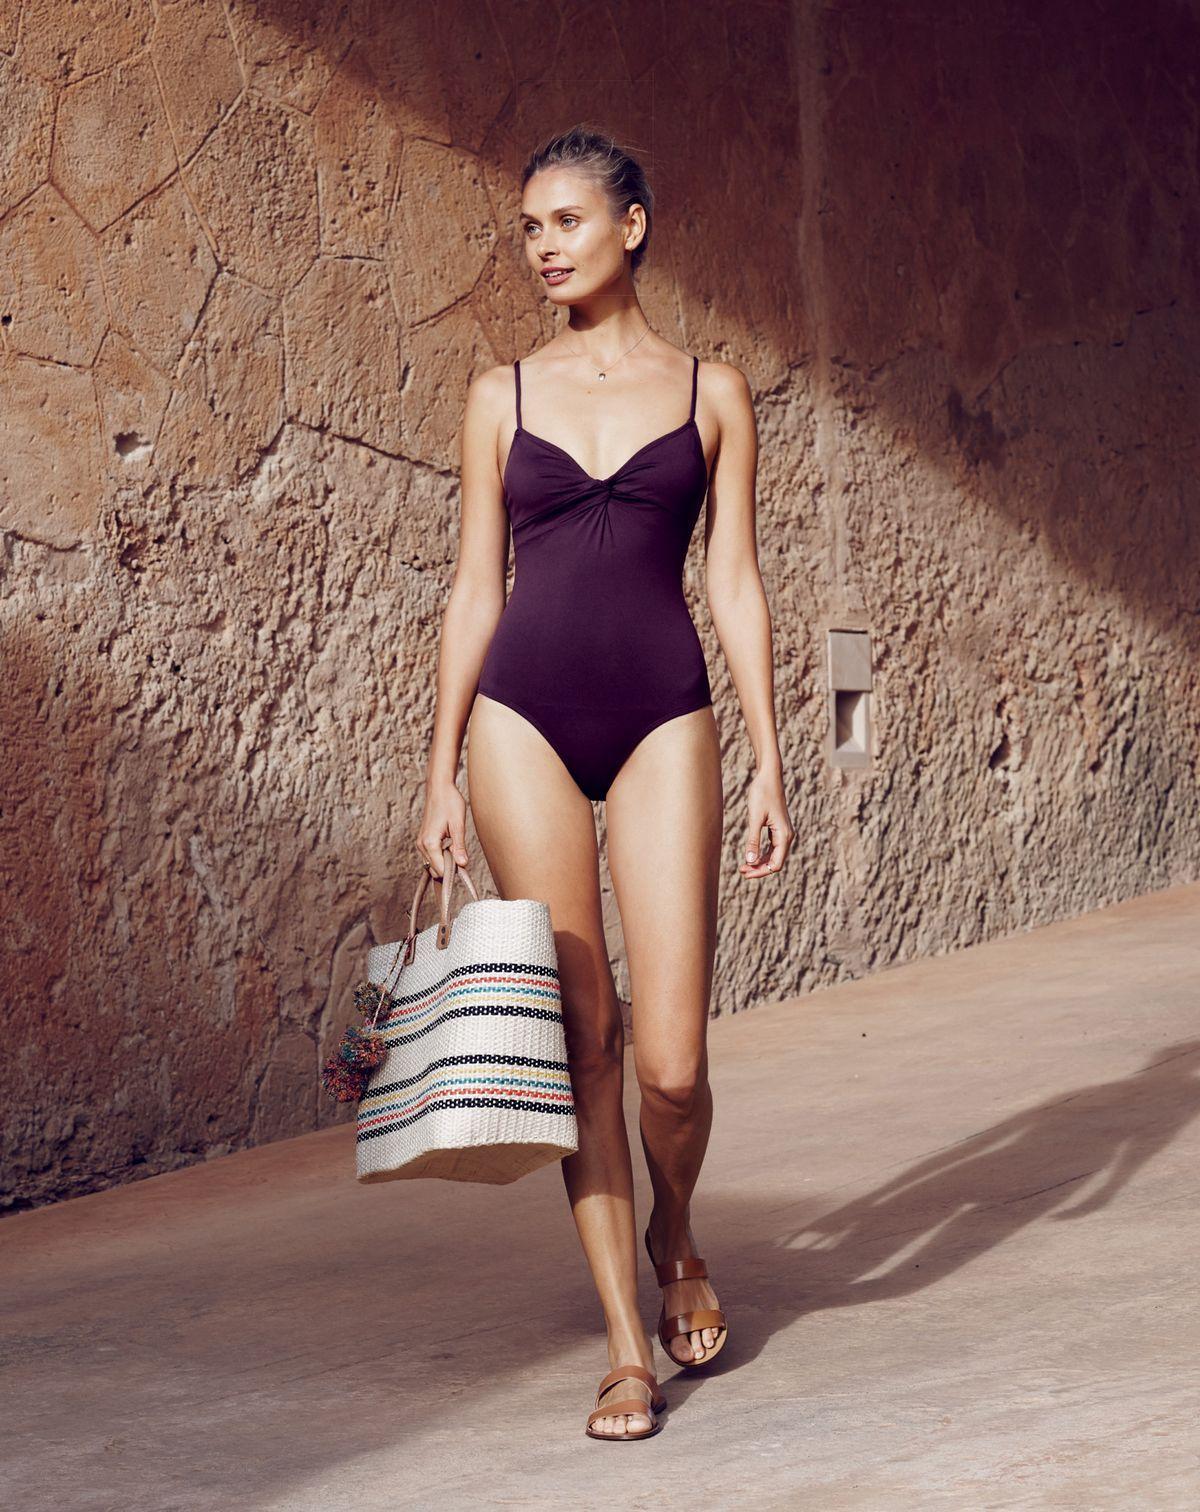 0e58b69d8adad J.Crew women's Italian matte twist-front one-piece swimsuit and Mar Y Sol  Caracas tote bag.